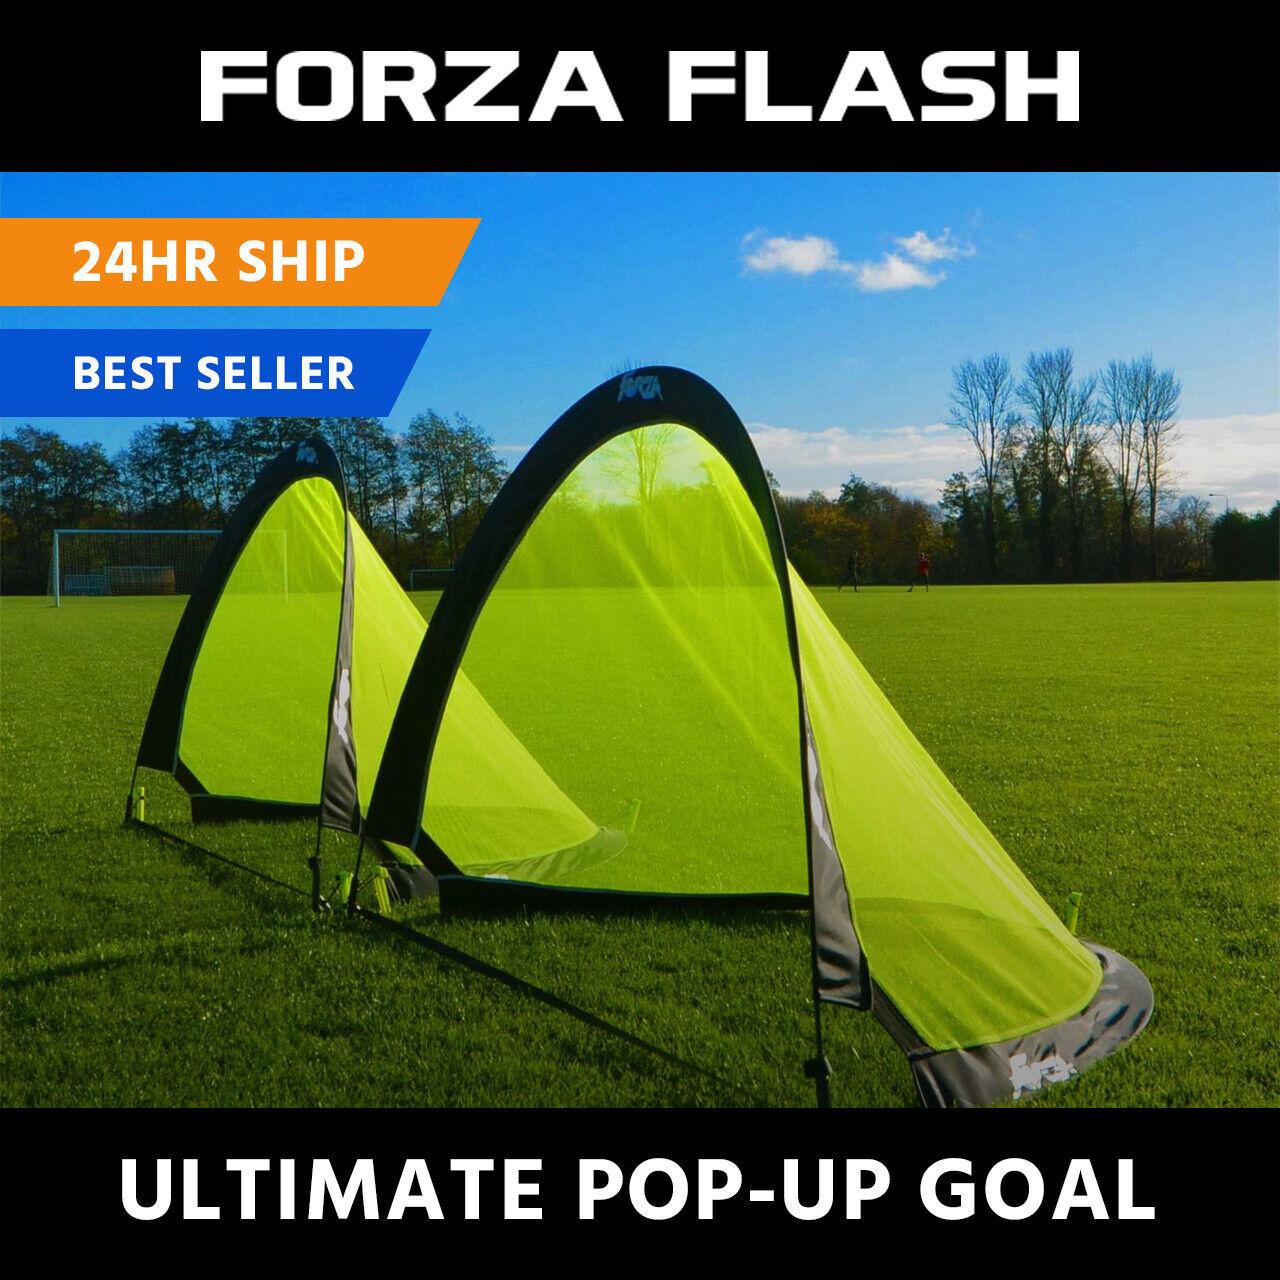 Forza flash pop-up de destino fútbol objetivo  3 Tamaños [Net World Sports]